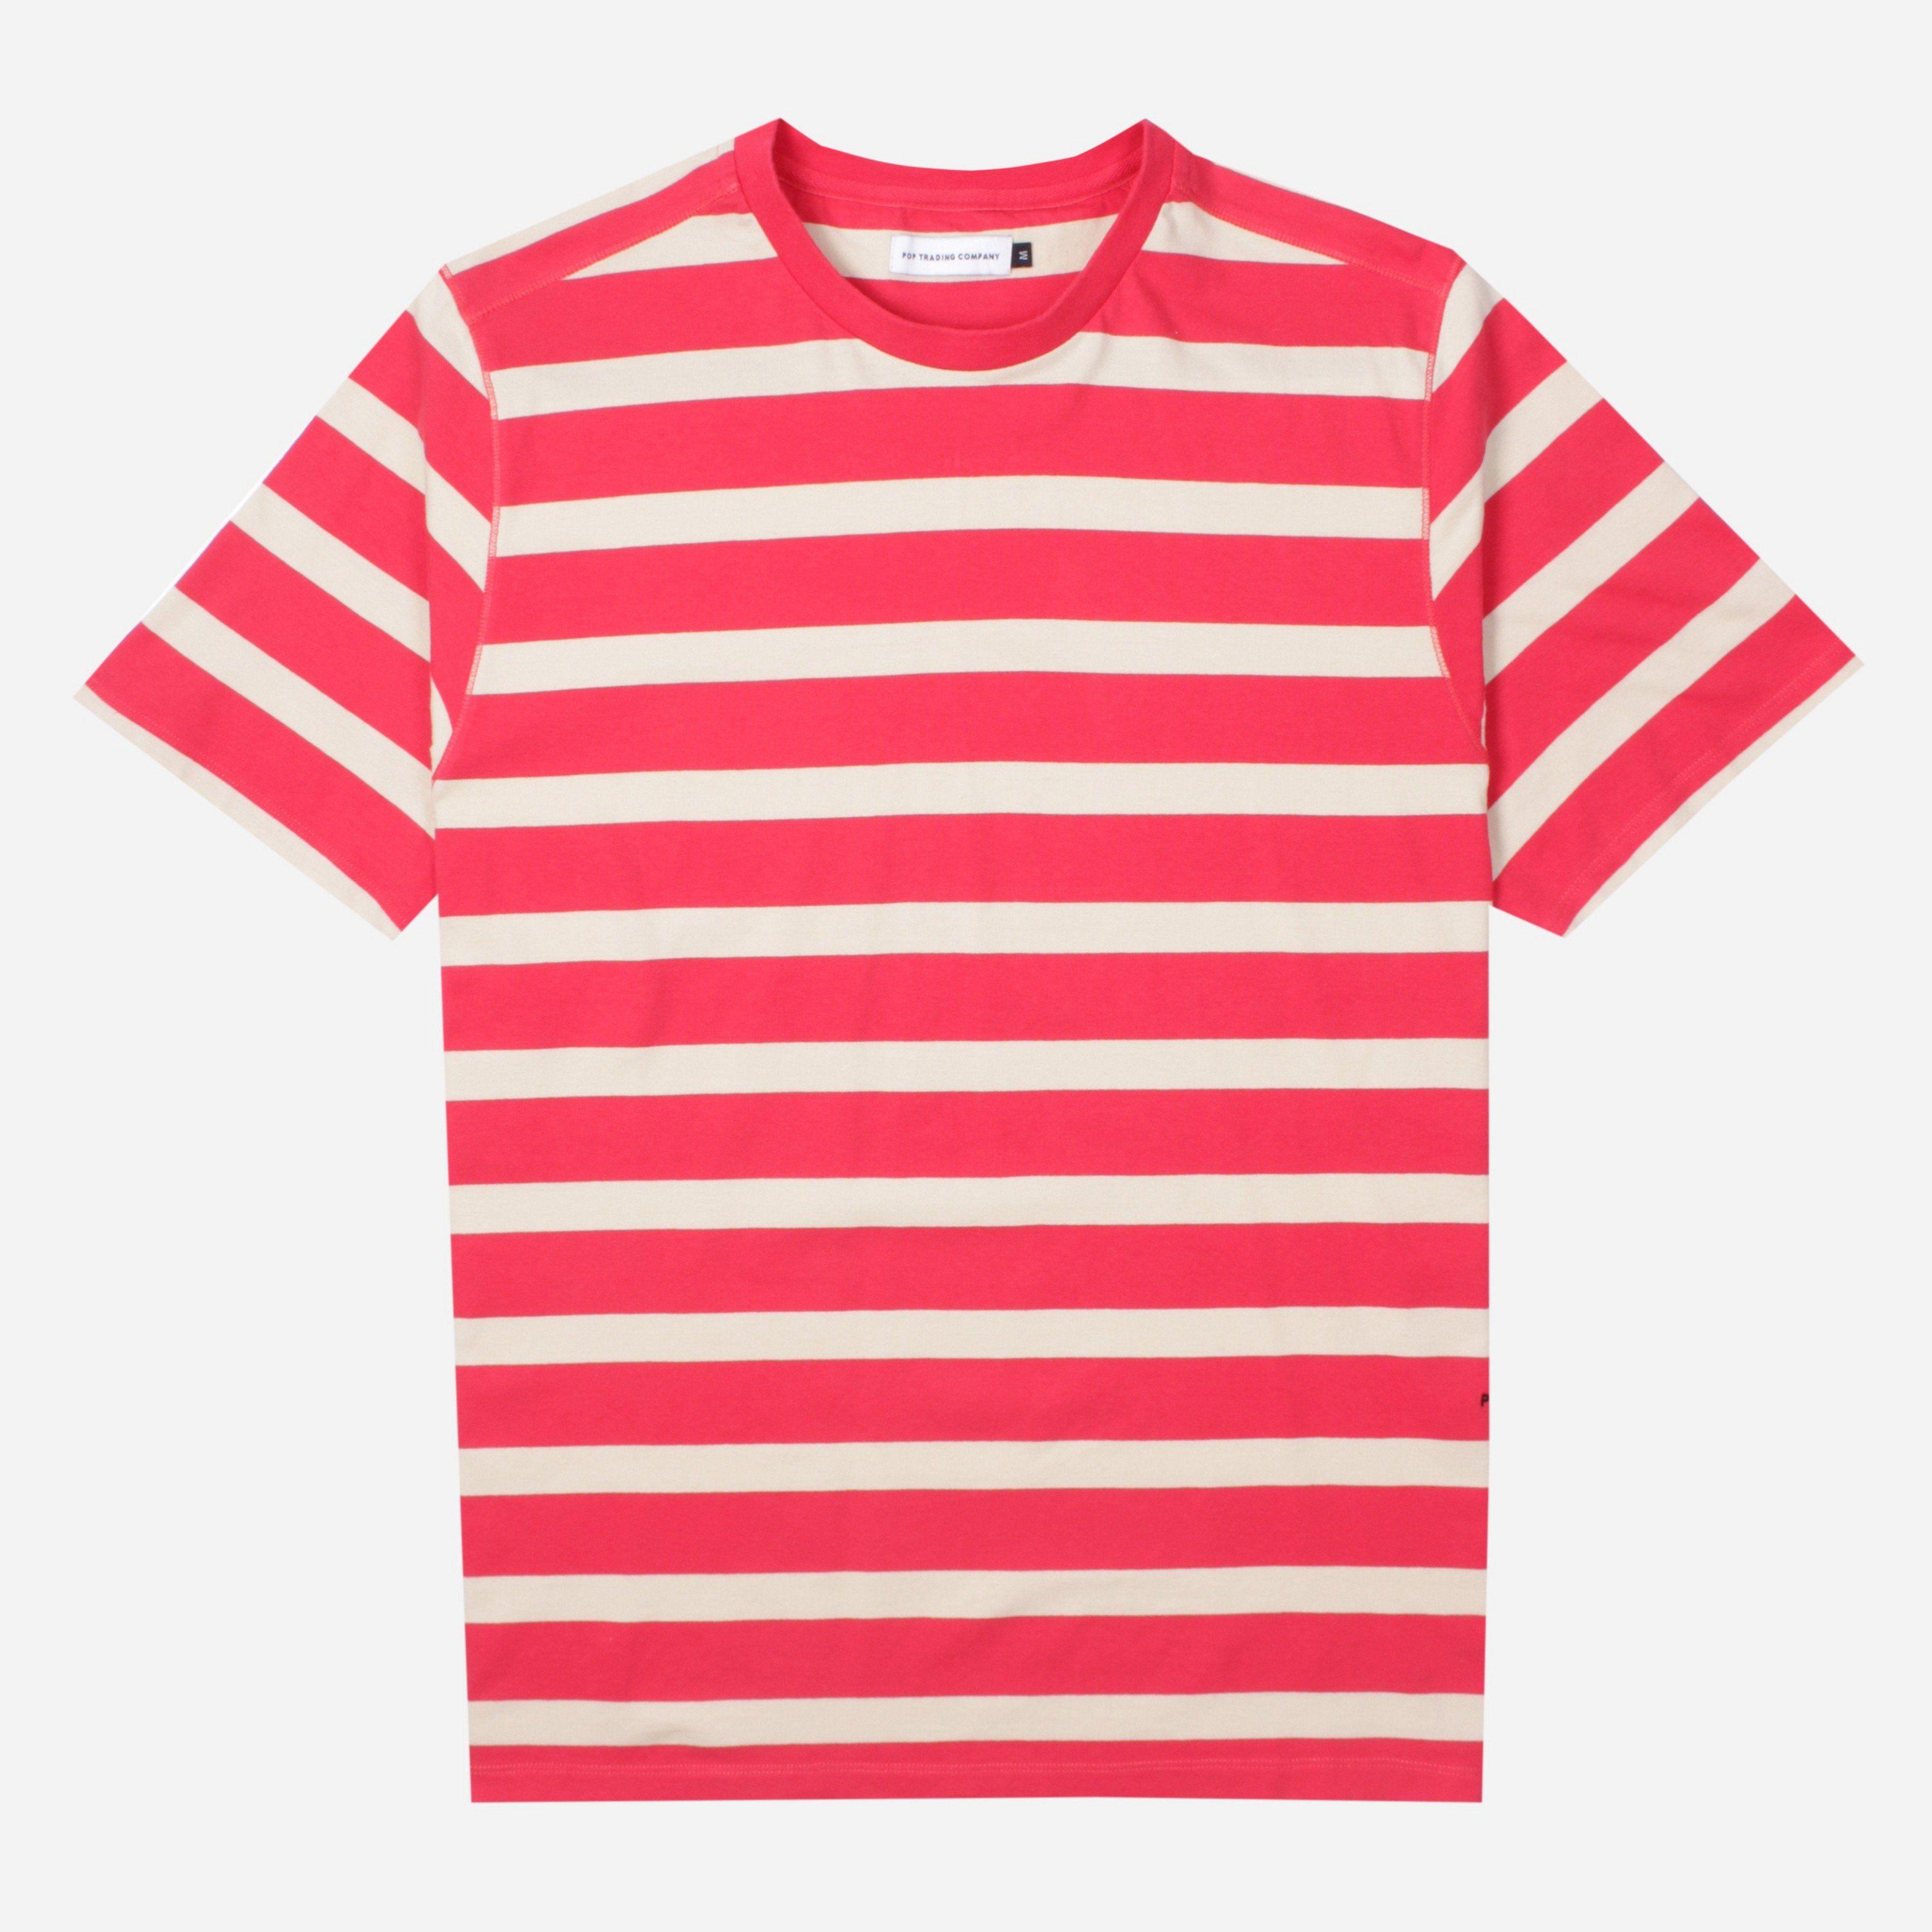 Pop Trading Company Big Stripe T-Shirt